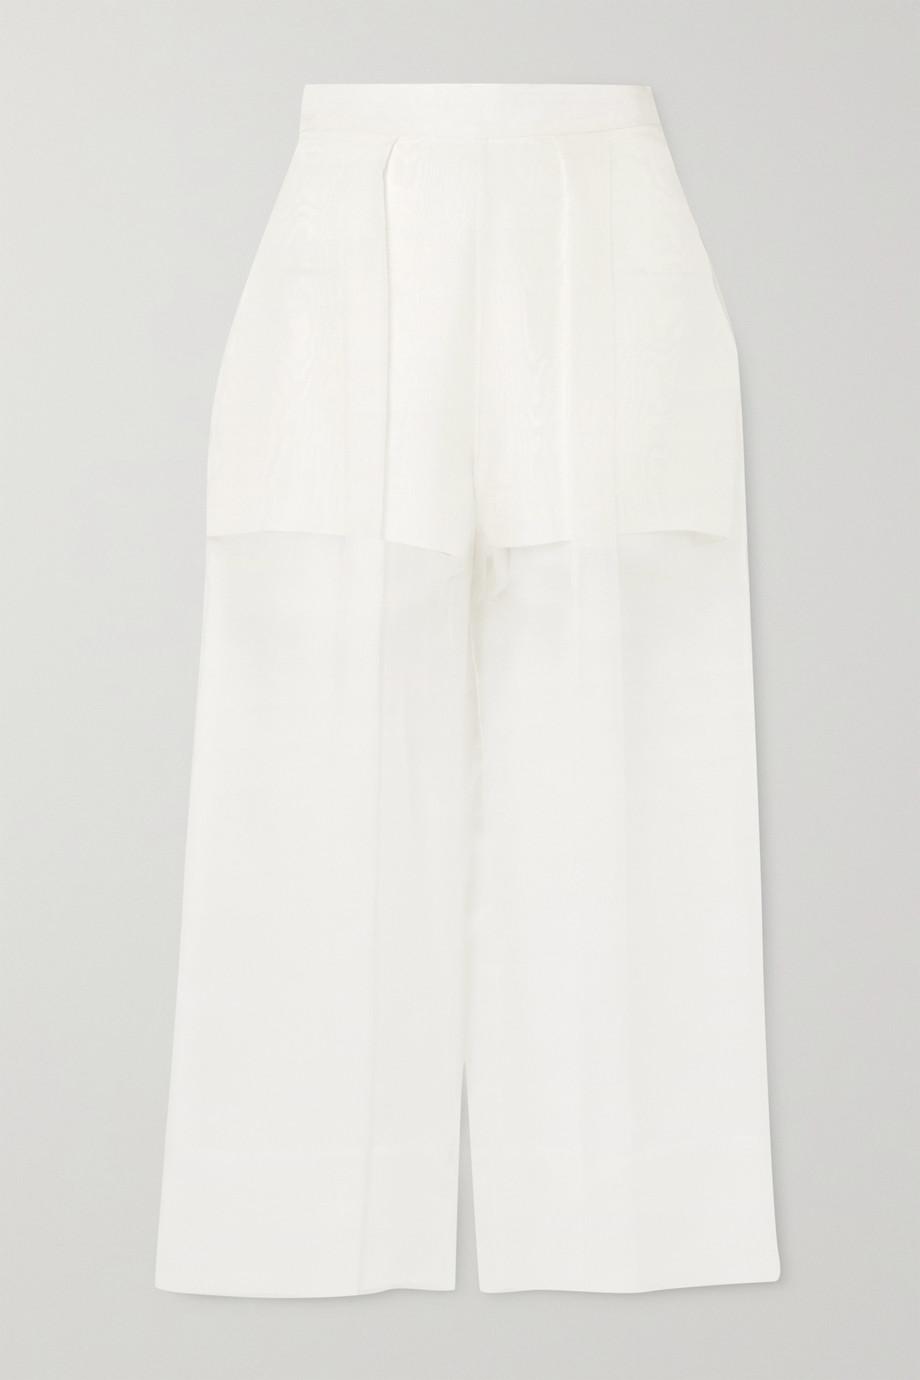 Cushnie Cropped silk-organza and crepe wide-leg pants